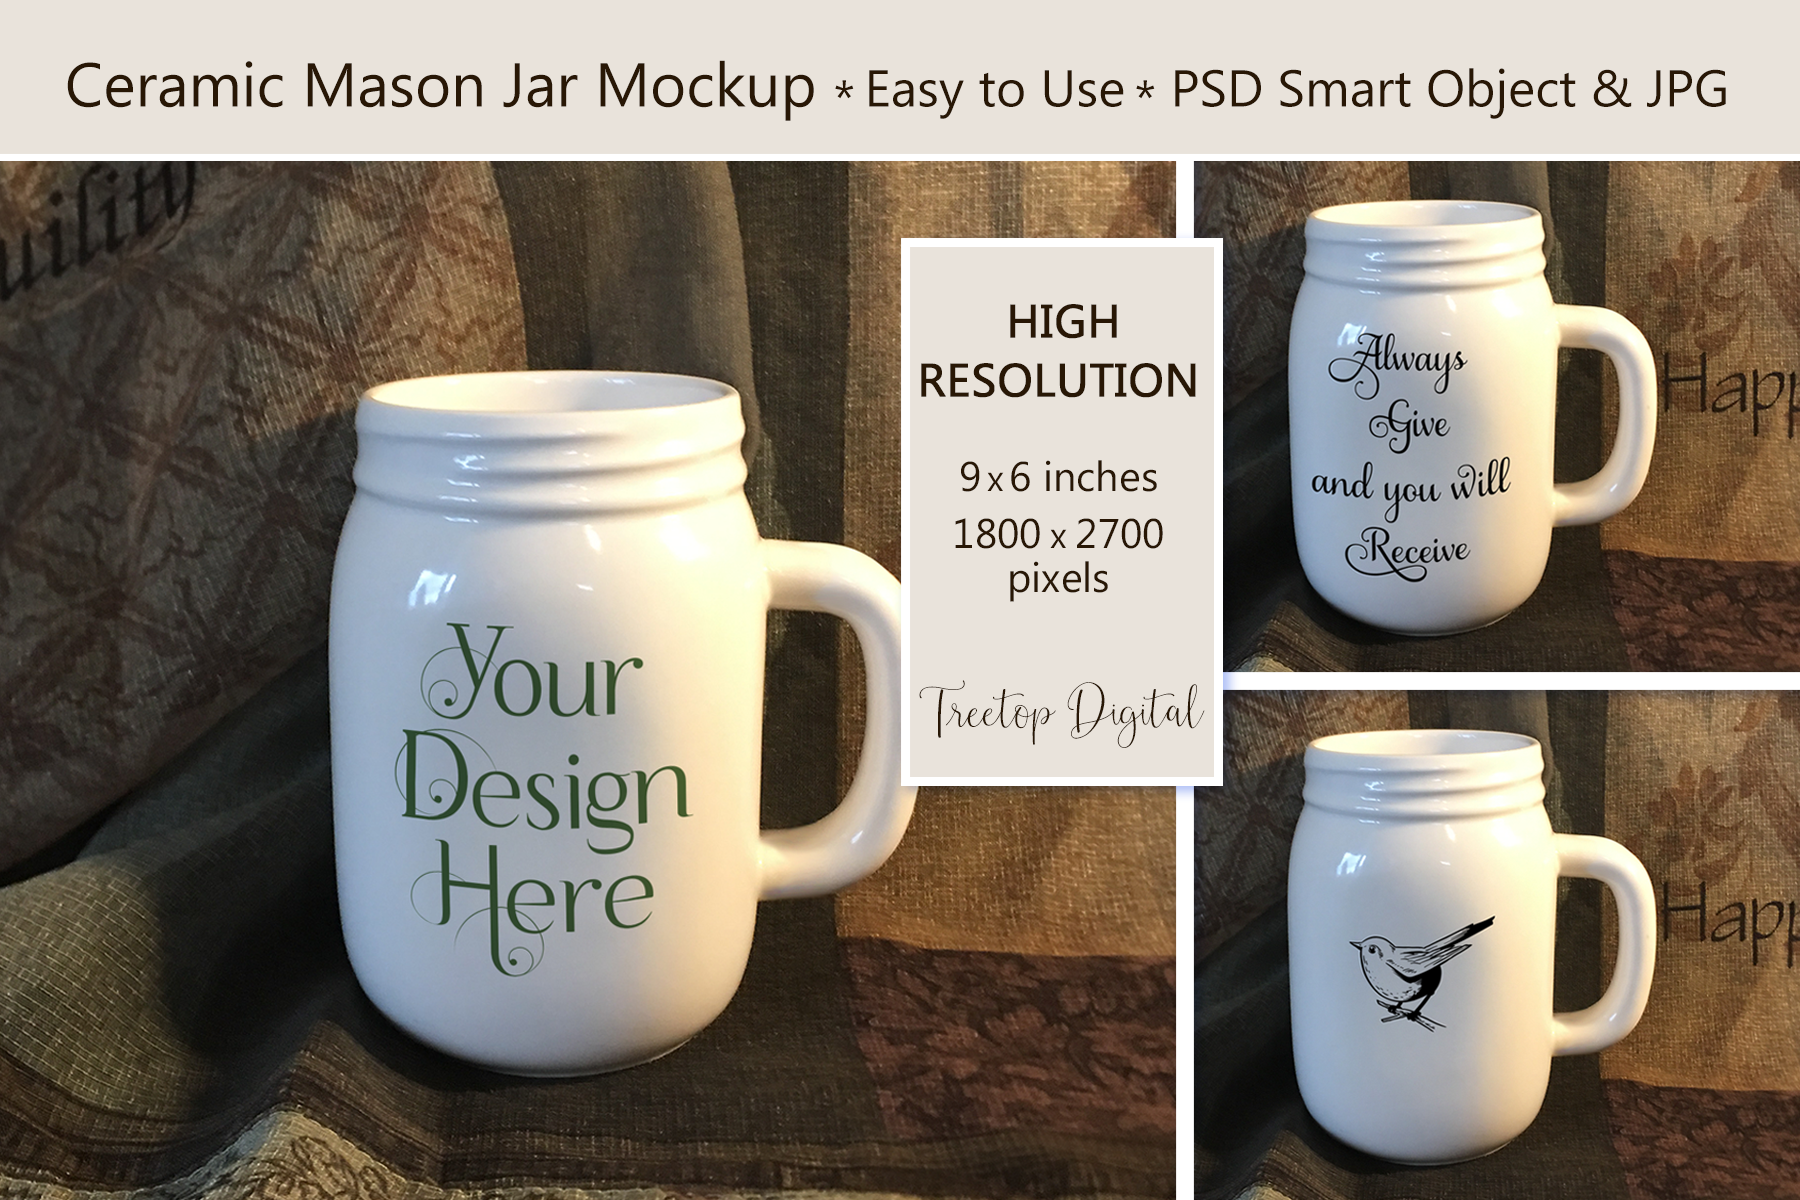 Mason Jar Mug Mockup, PSD Smart Object & JPG Mock-Up example image 1